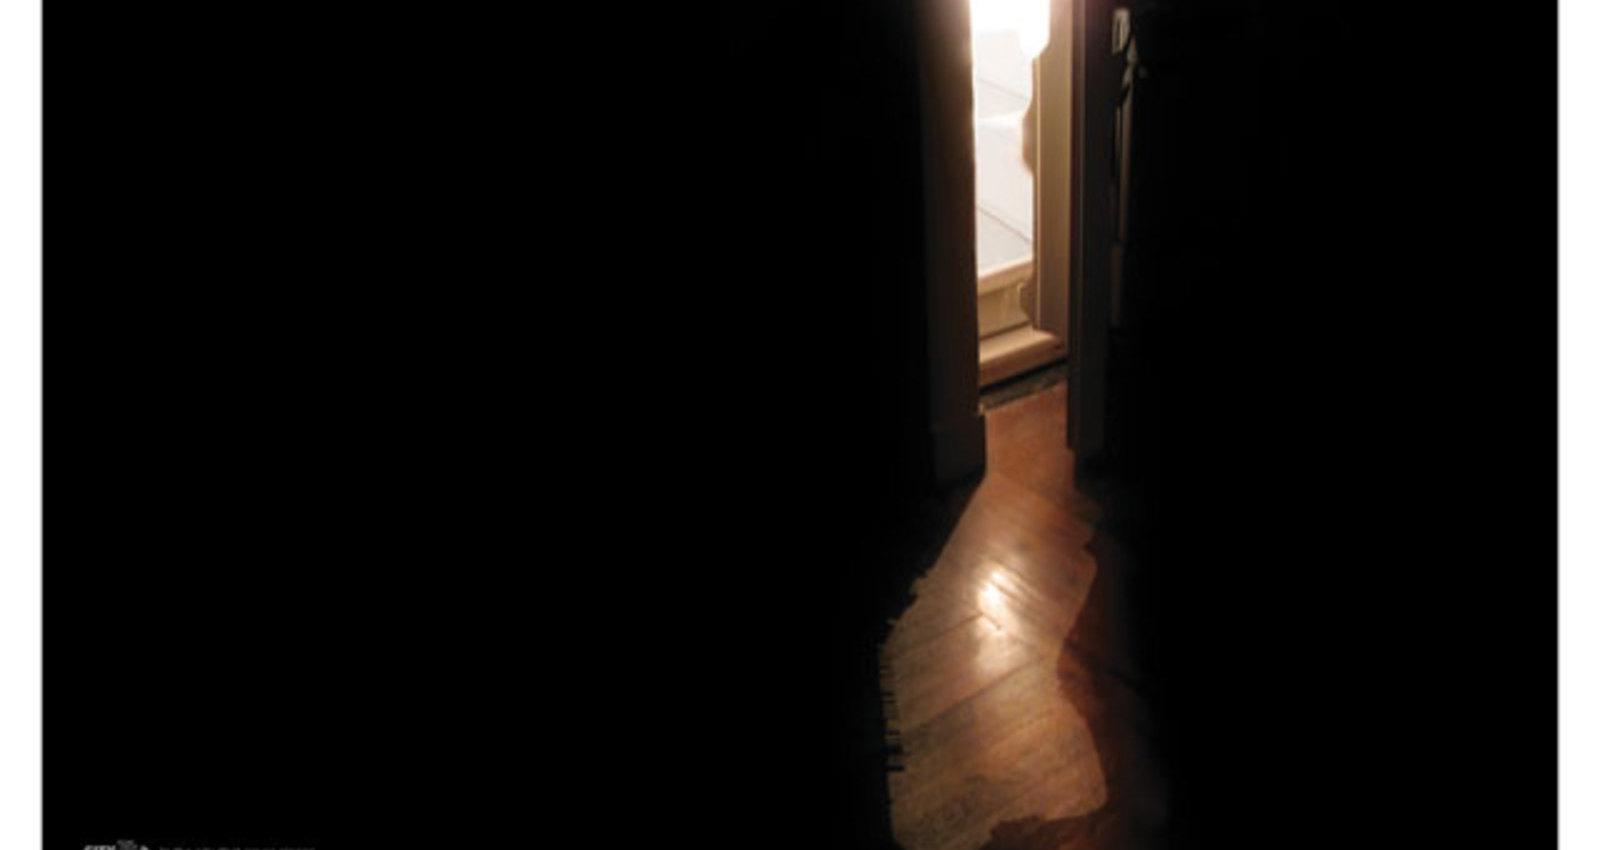 Refrigerator Shadows